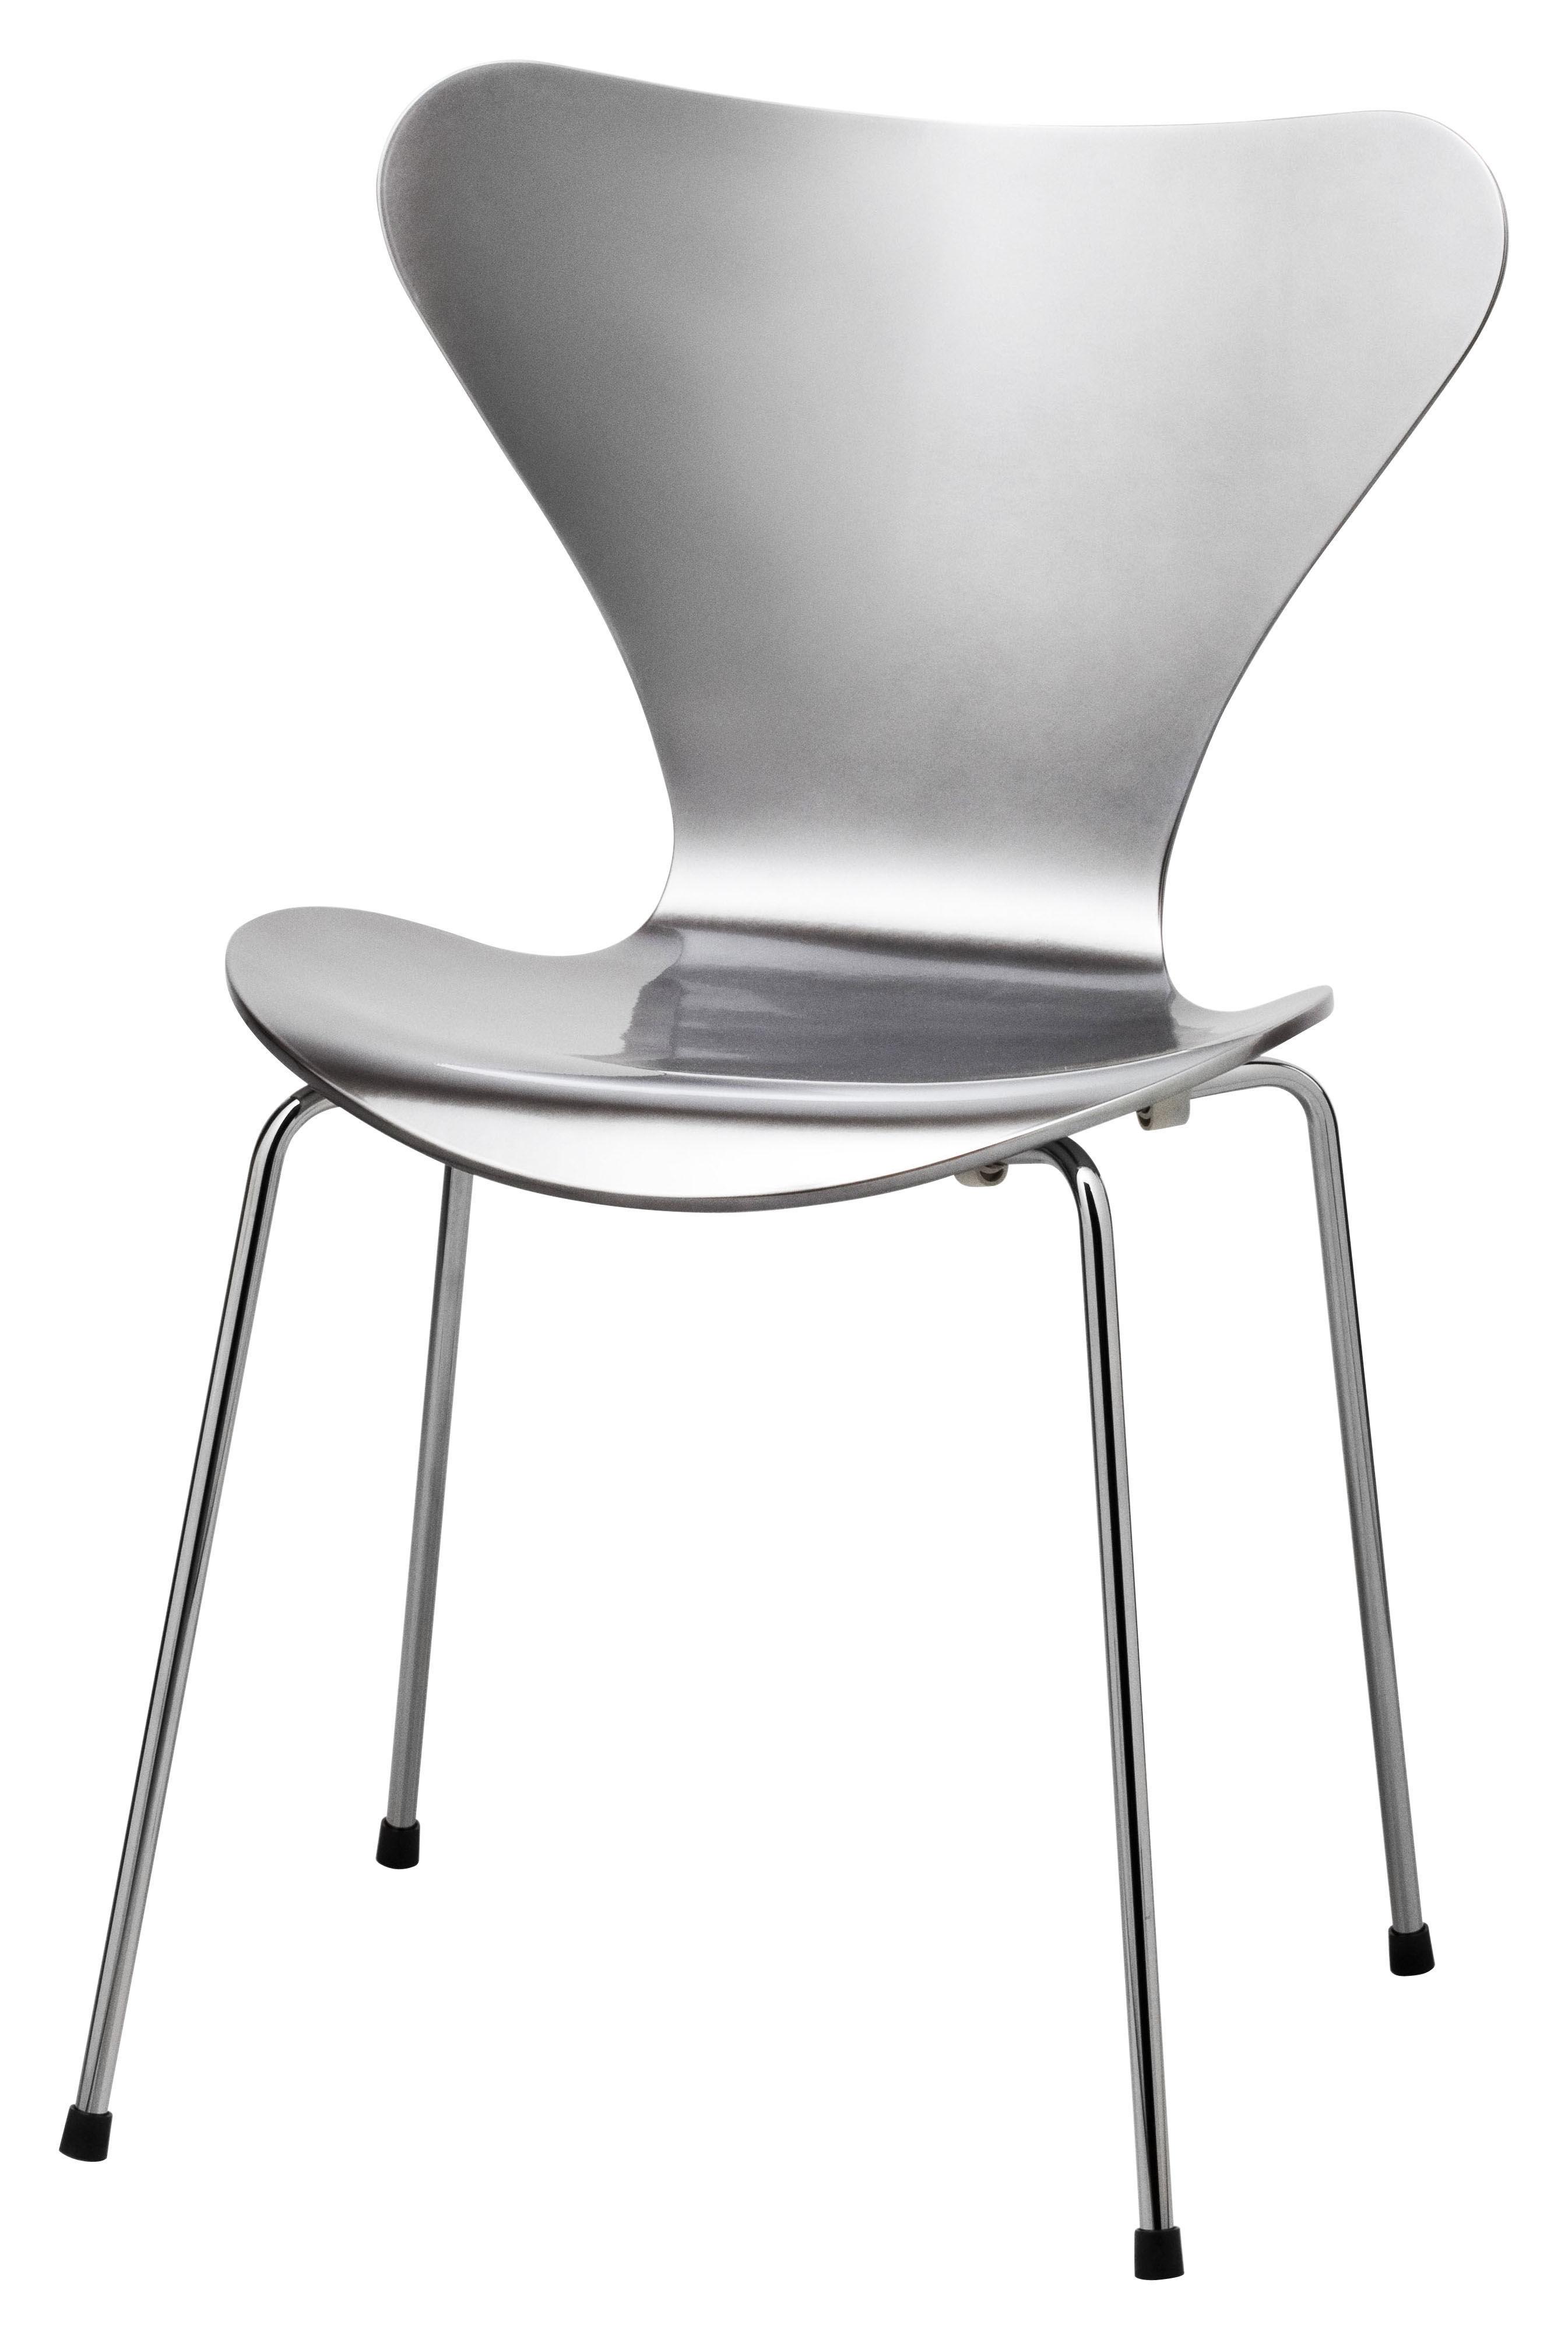 chaise empilable s rie 7 laqu e coloris exclusif aluminium poli fritz hansen. Black Bedroom Furniture Sets. Home Design Ideas